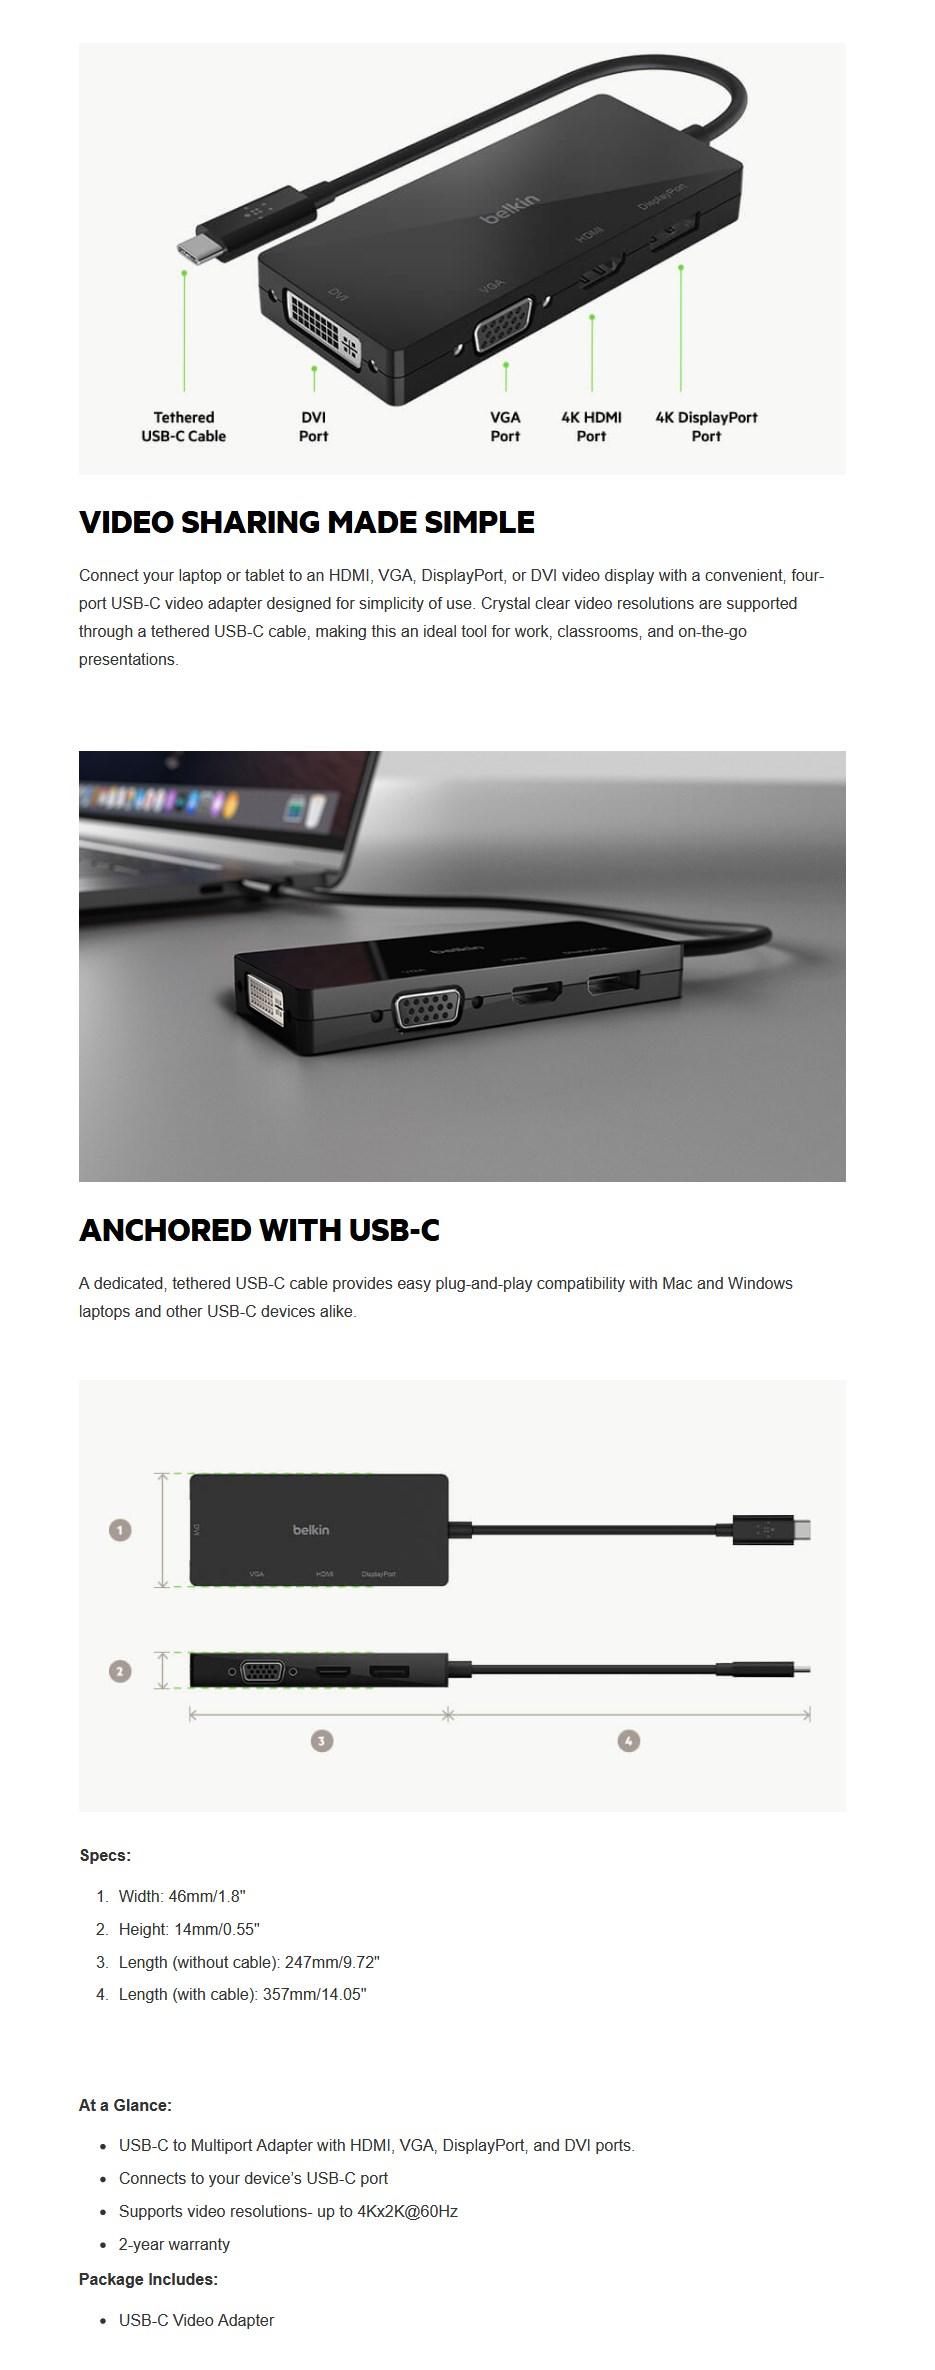 Belkin USB-C Multi-Port Video Adapter - Overview 1